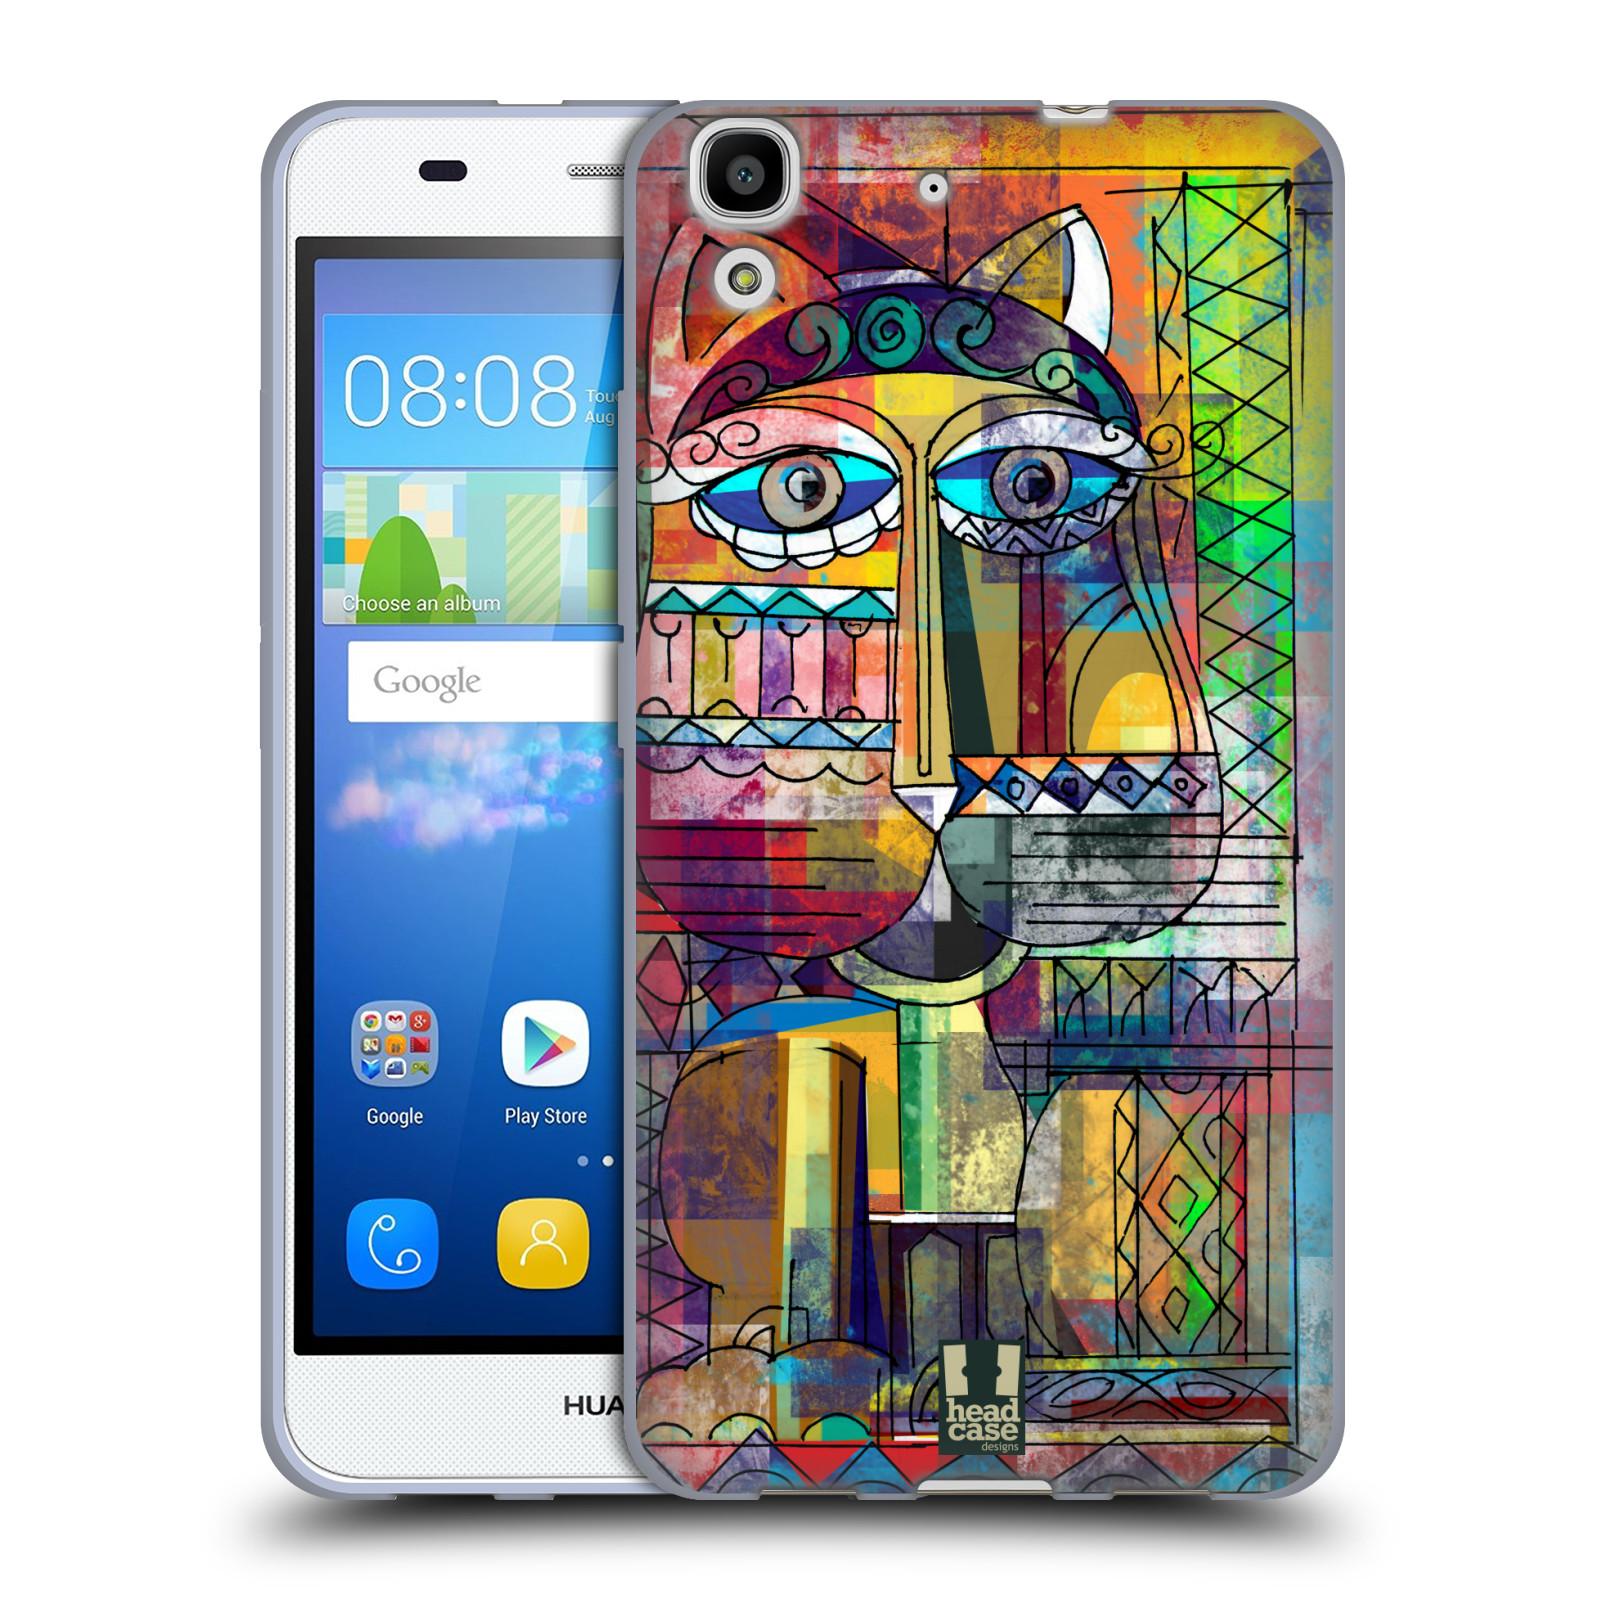 Silikonové pouzdro na mobil Huawei Y6 HEAD CASE AZTEC KORAT